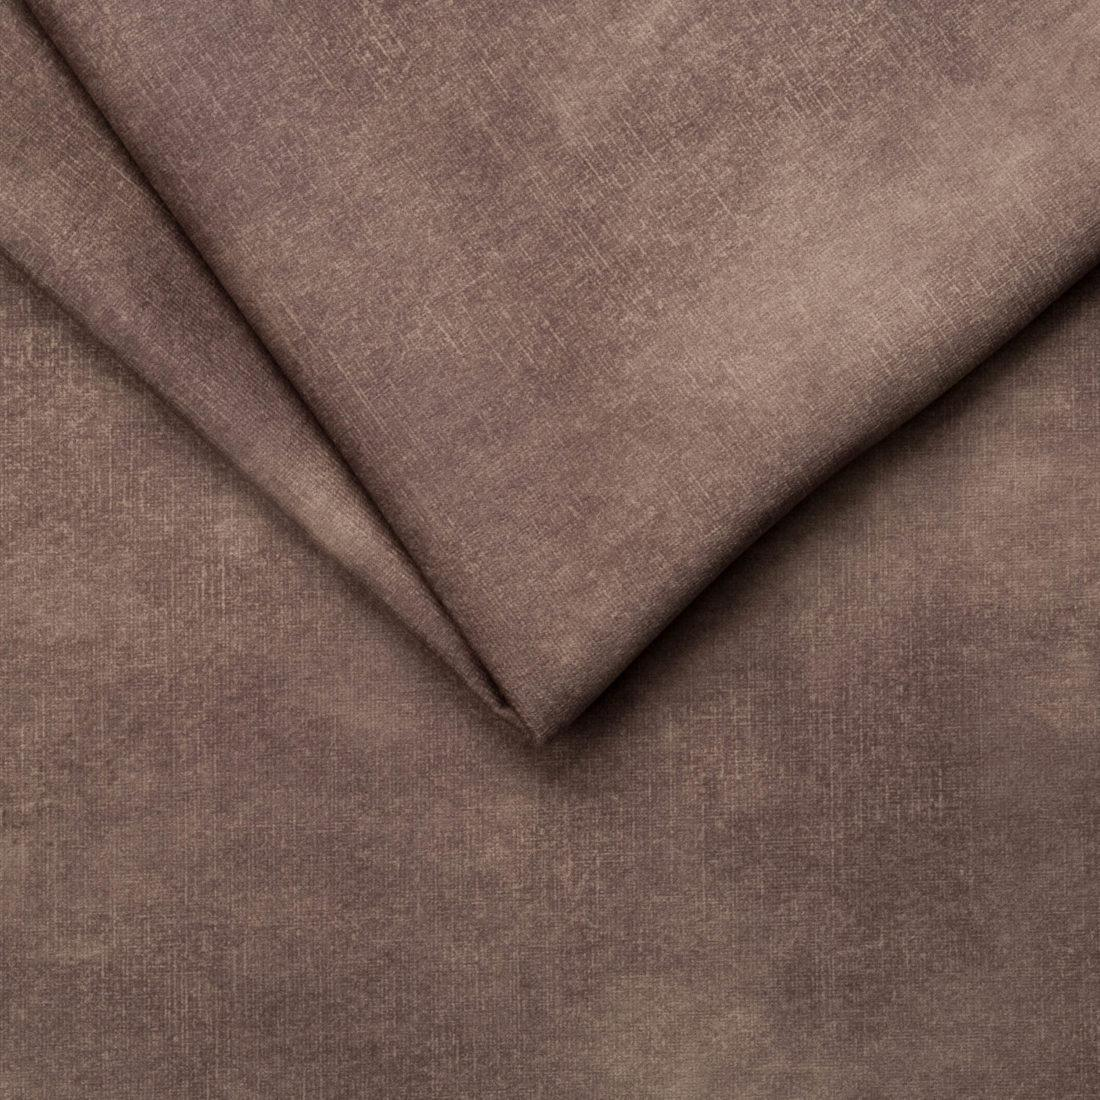 Меблева тканина Palladium 5 Brown, велюр